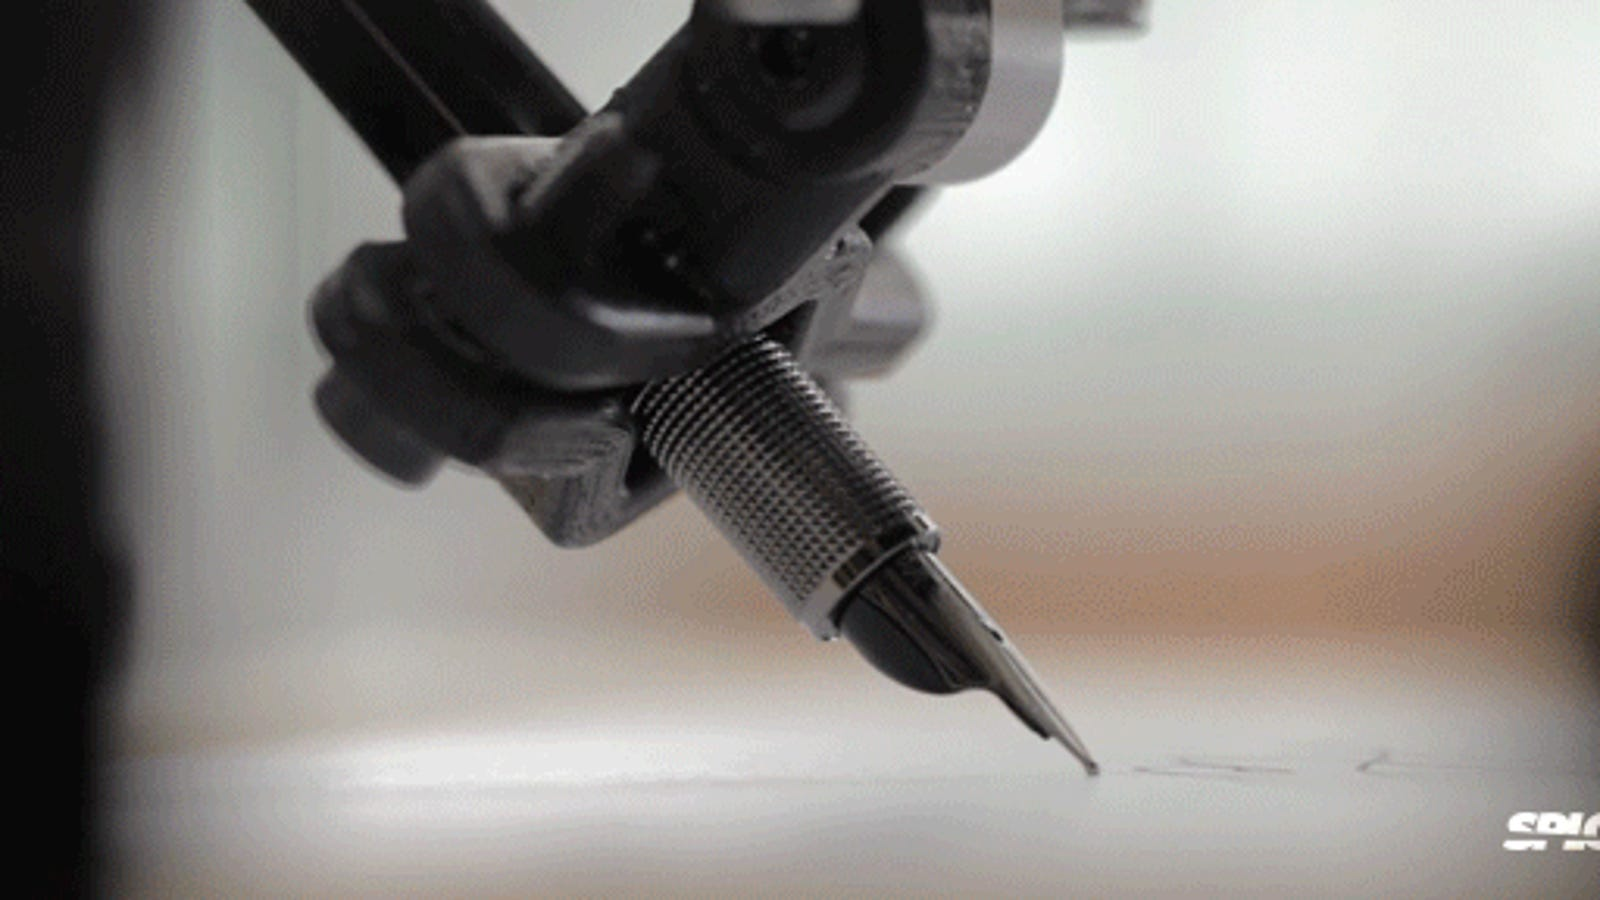 Calligraphic robot imitates your handwriting using a fountain pen